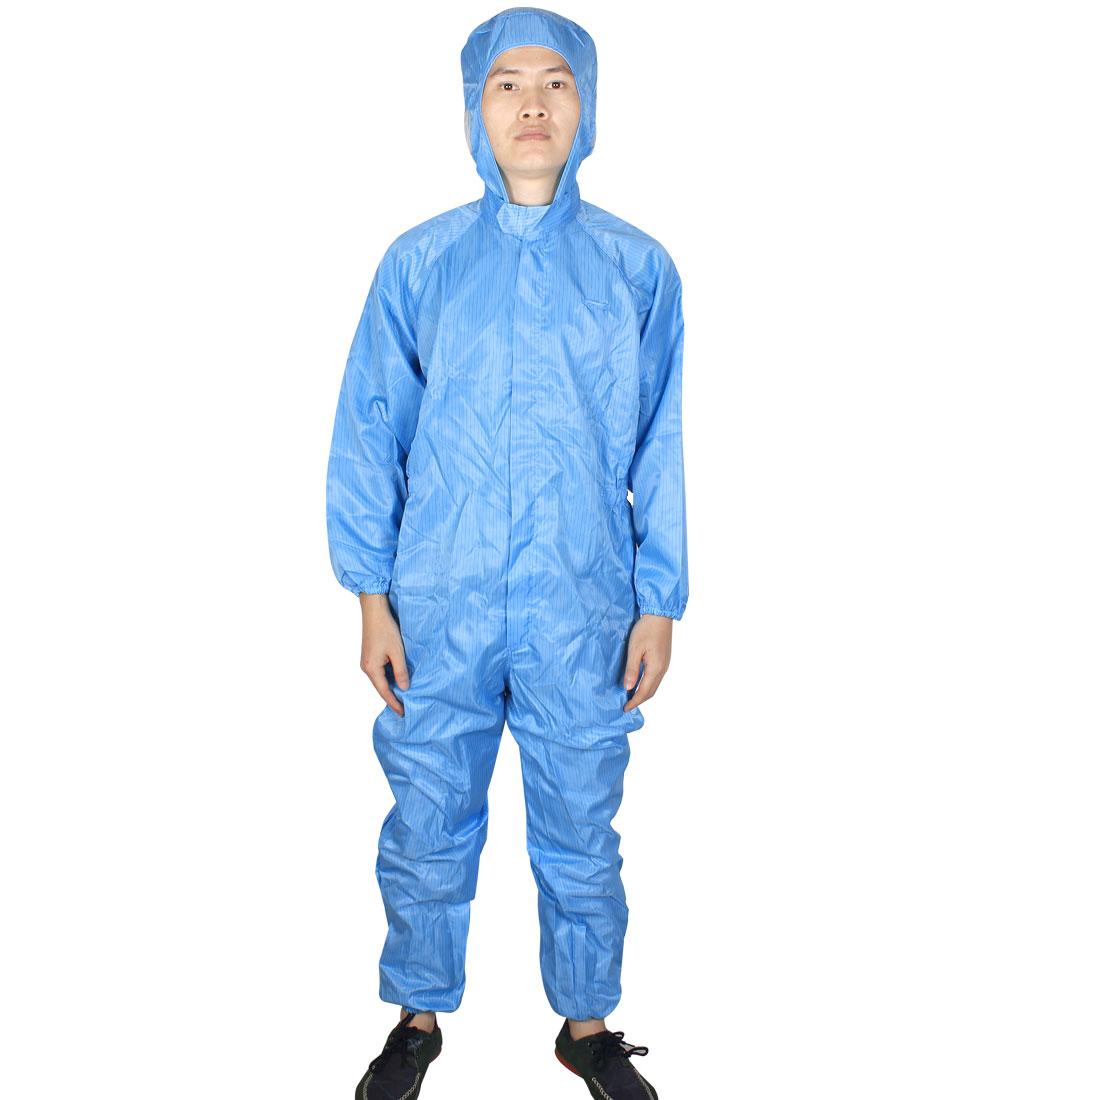 Unisex Long Sleeve Zipper Stripes Pattern Hoodie Anti Static Jumpsuit Coverall Blue L